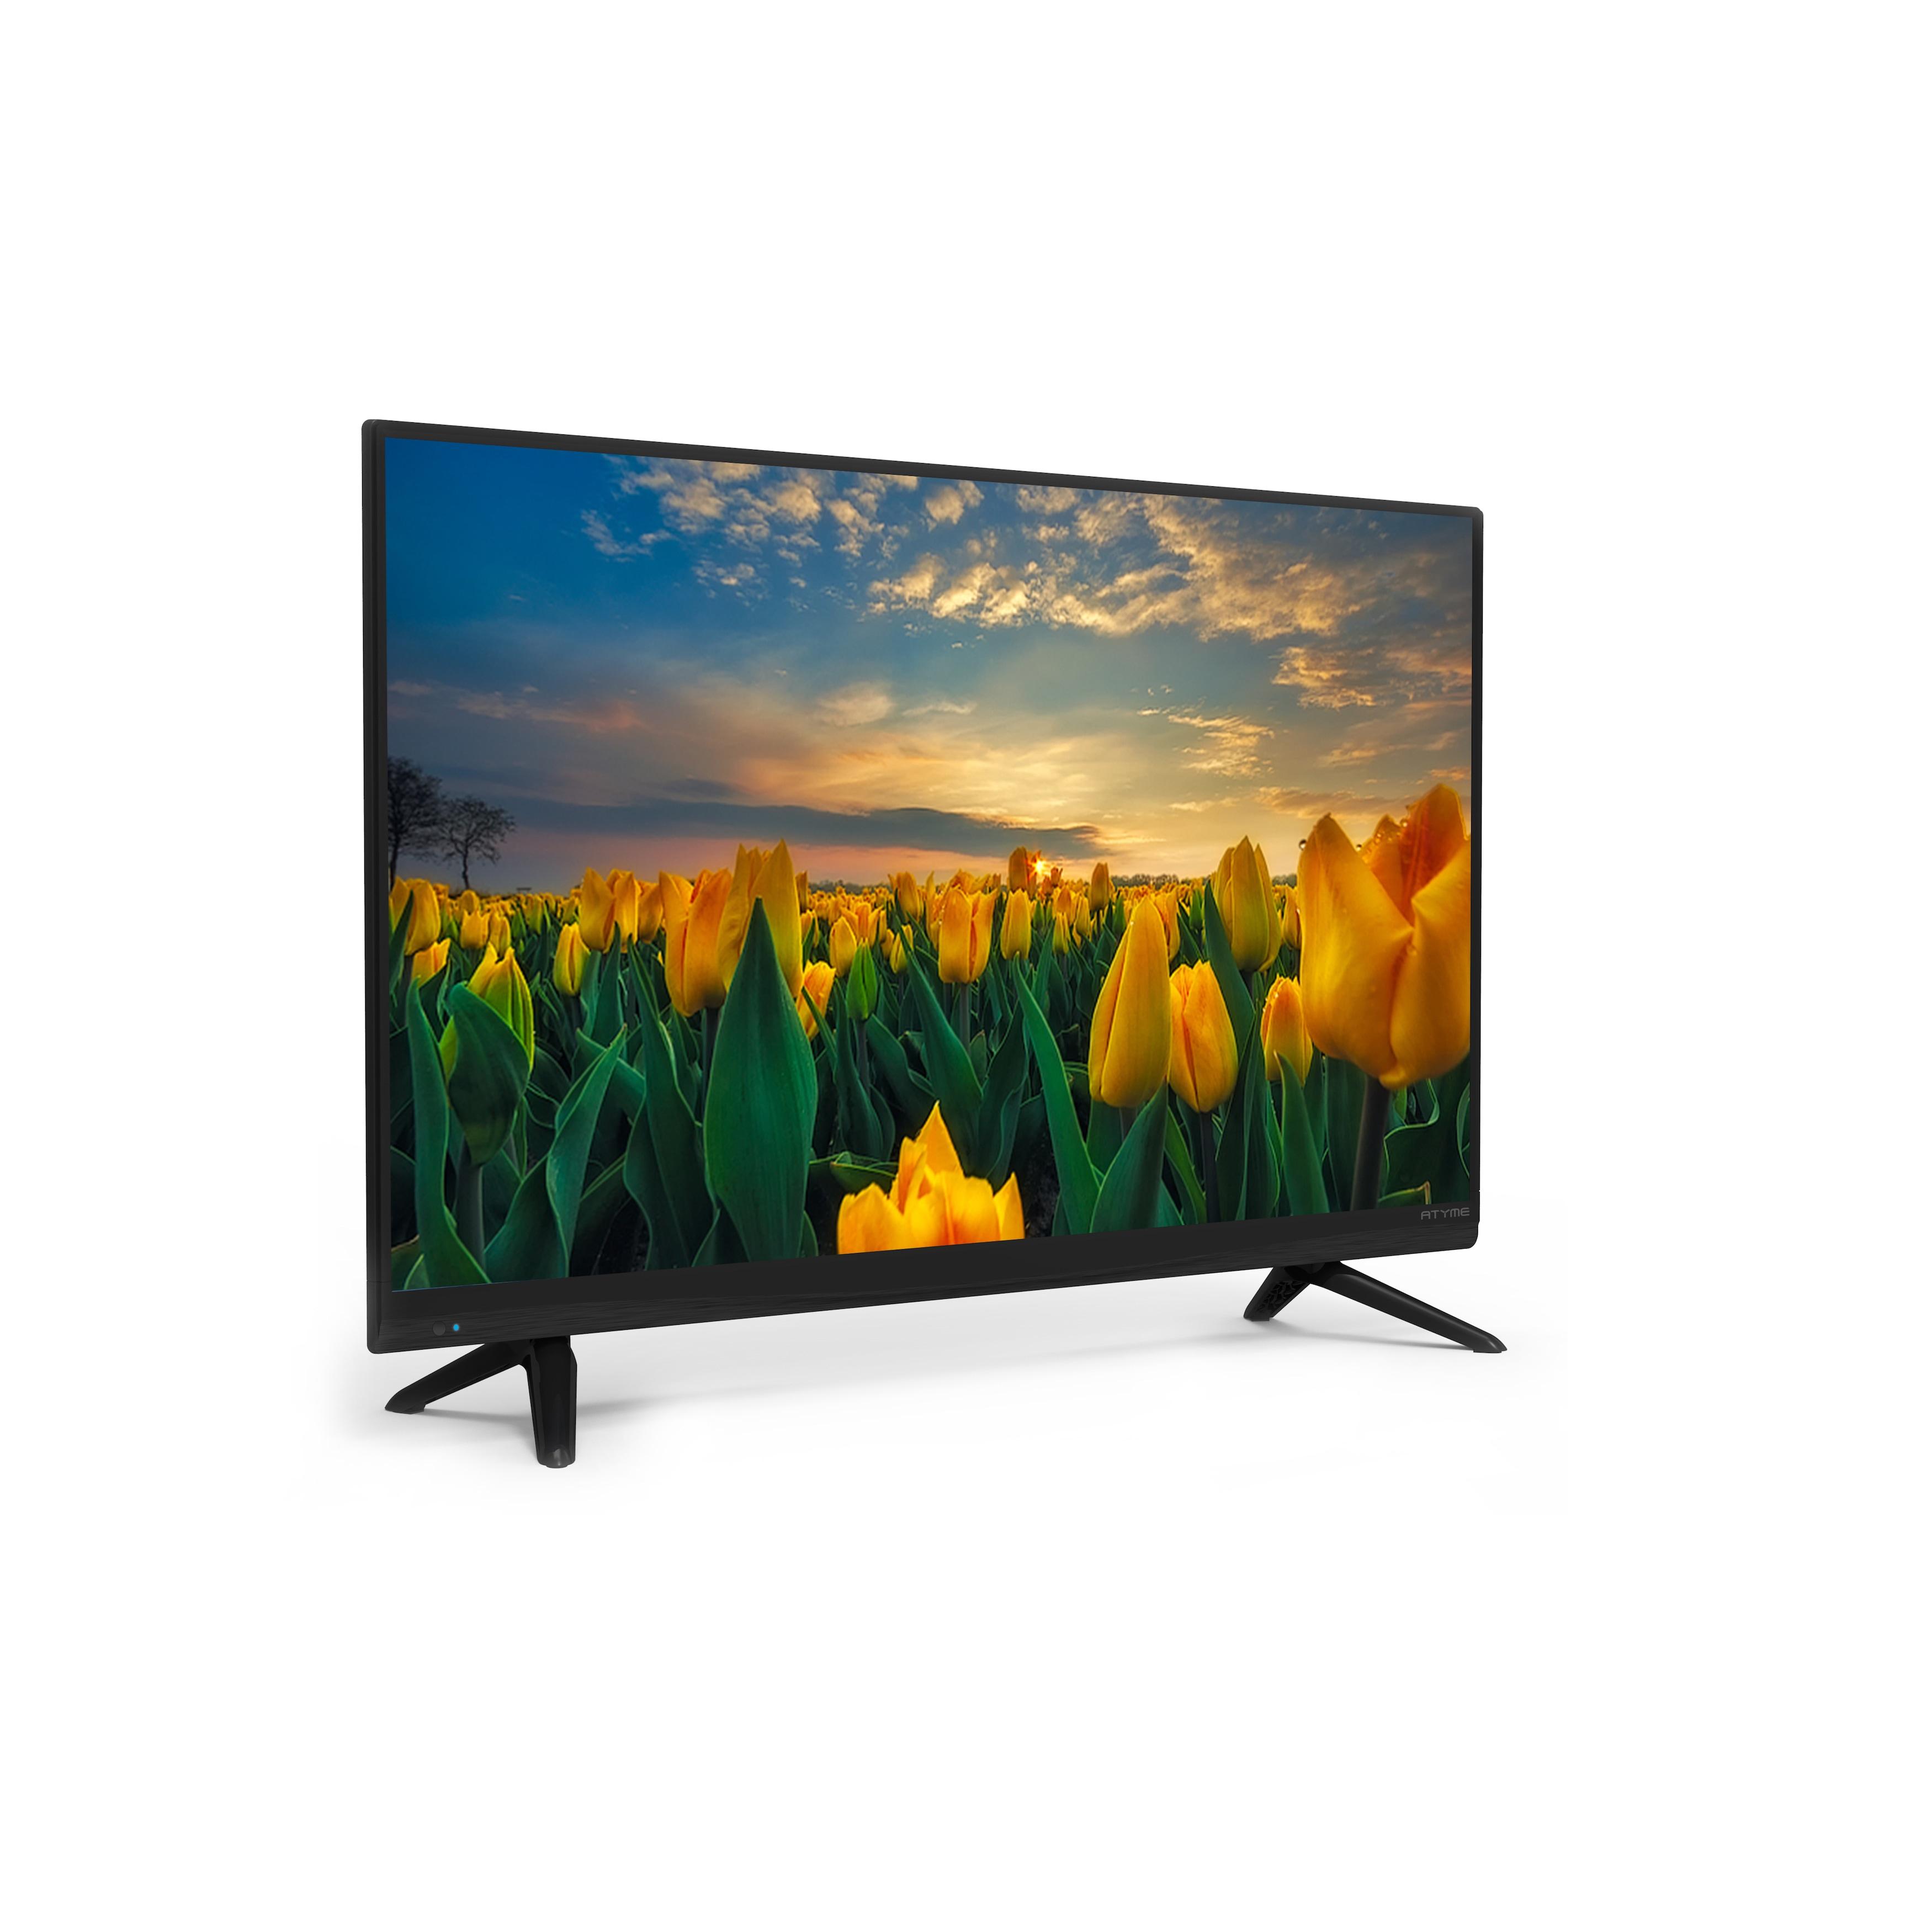 Atyme 32-inch Class 720P 60HZ LED Black TV/DVD Combo (Bla...